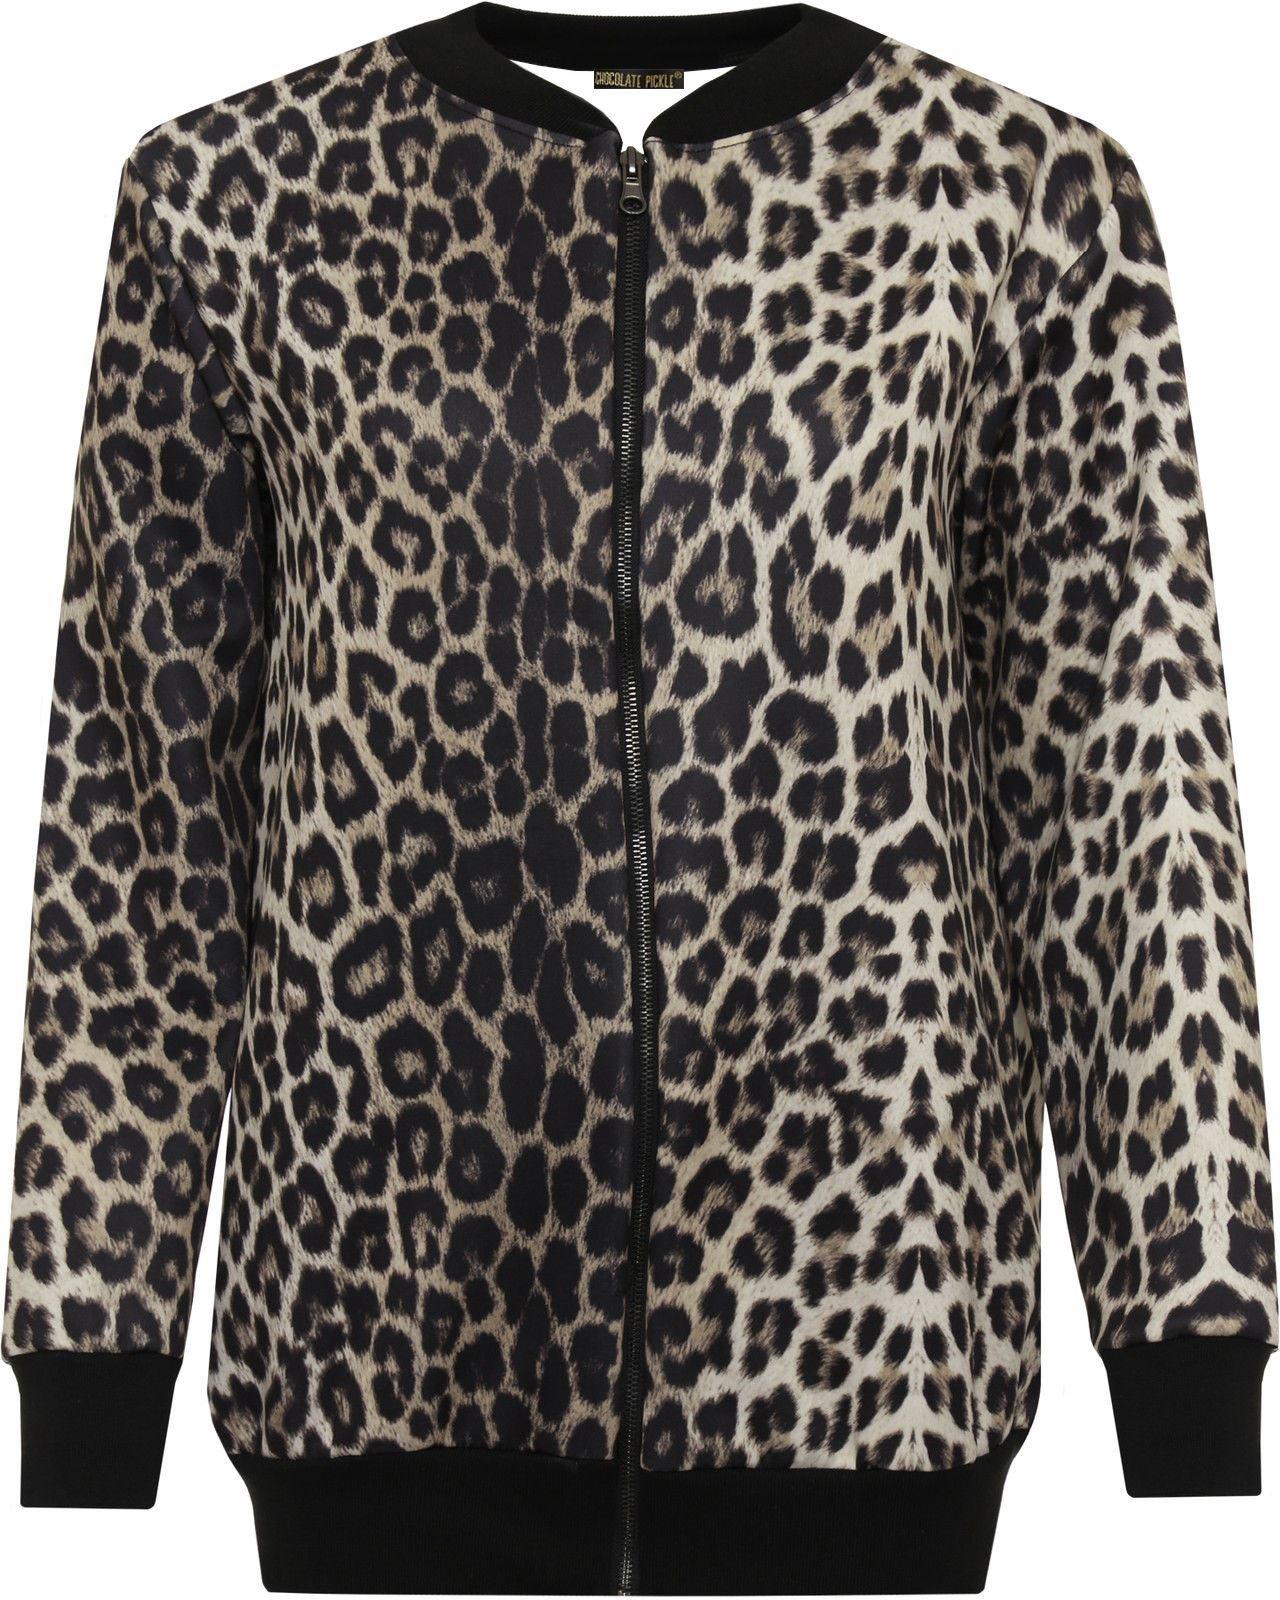 Chocolate Pickle New Ladies Leopard Print Ribbed Bomber Blazer Jacket Leopard Print 12